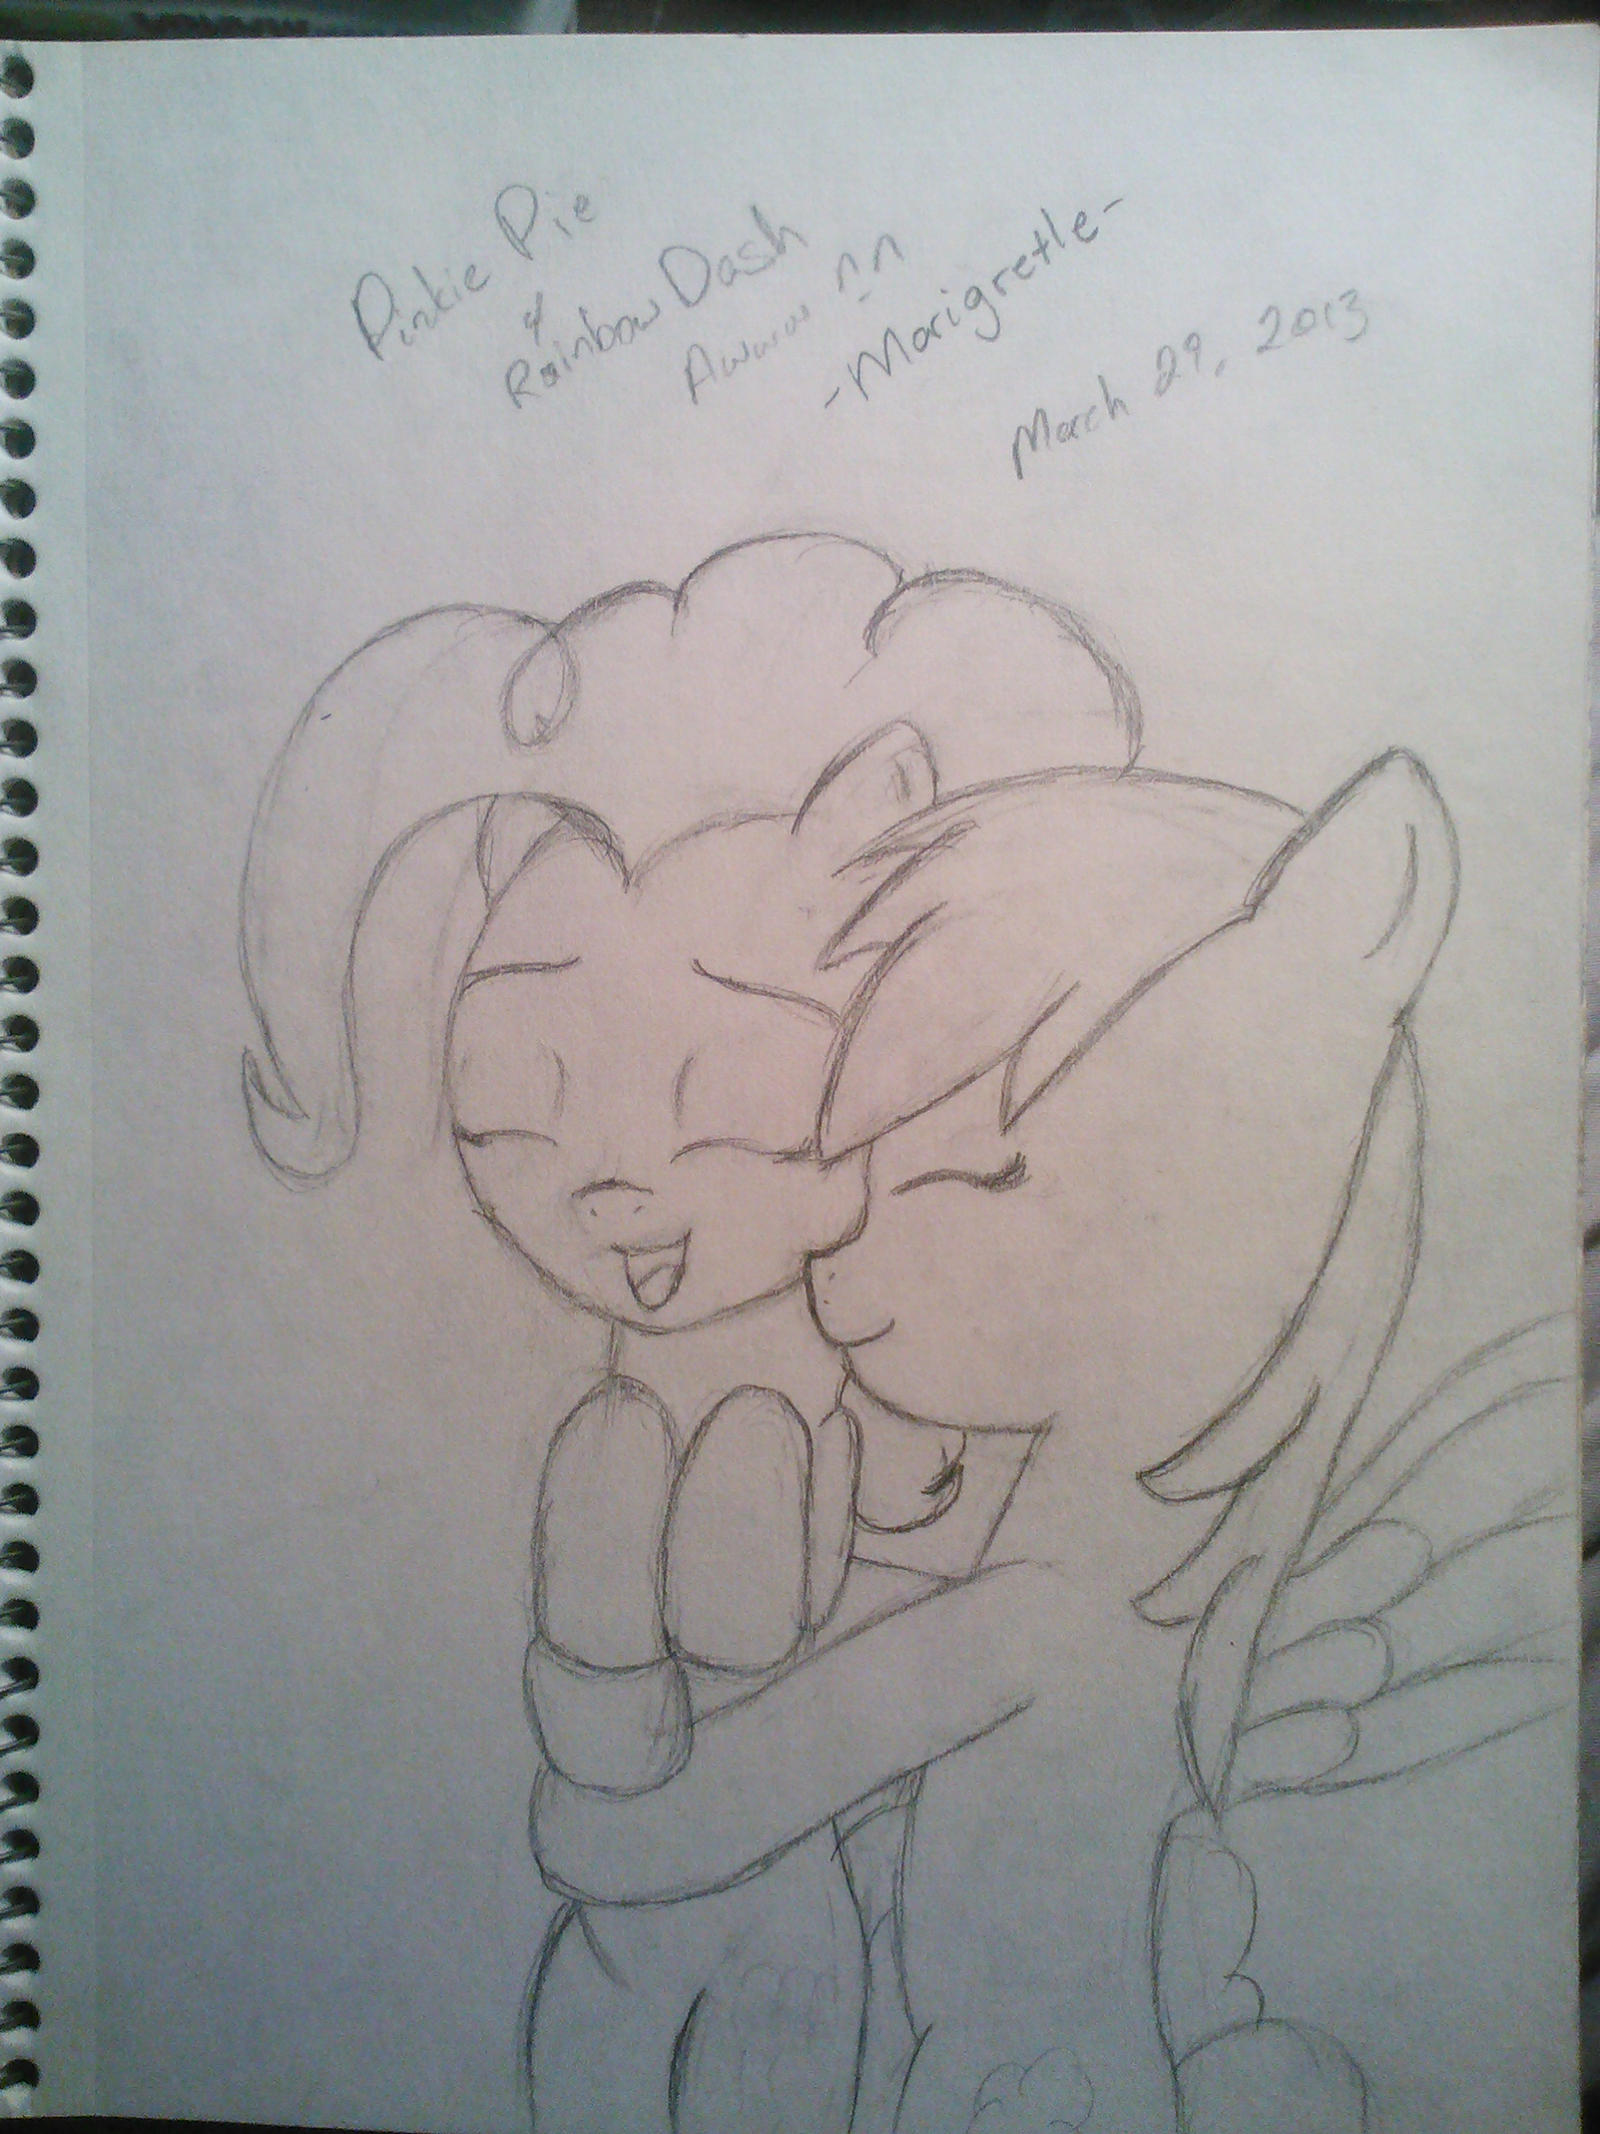 PinkieDash huggle by Marigretle